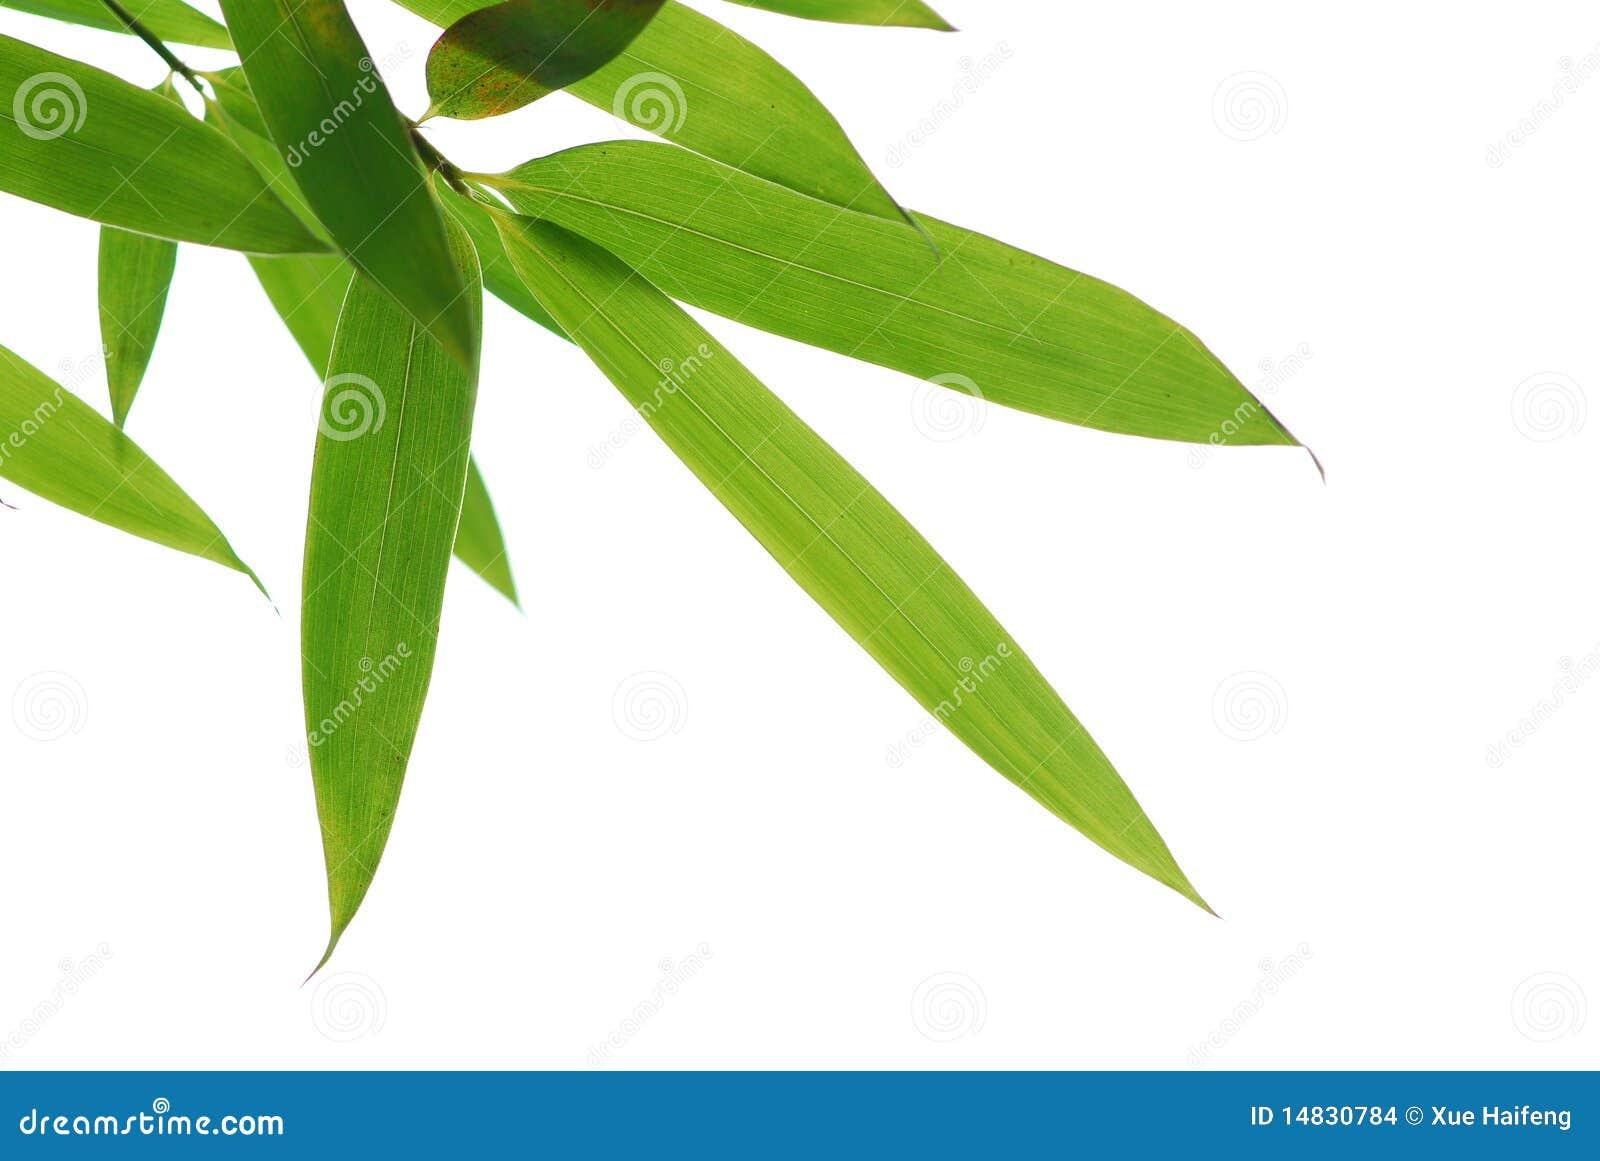 Bamboo leafs